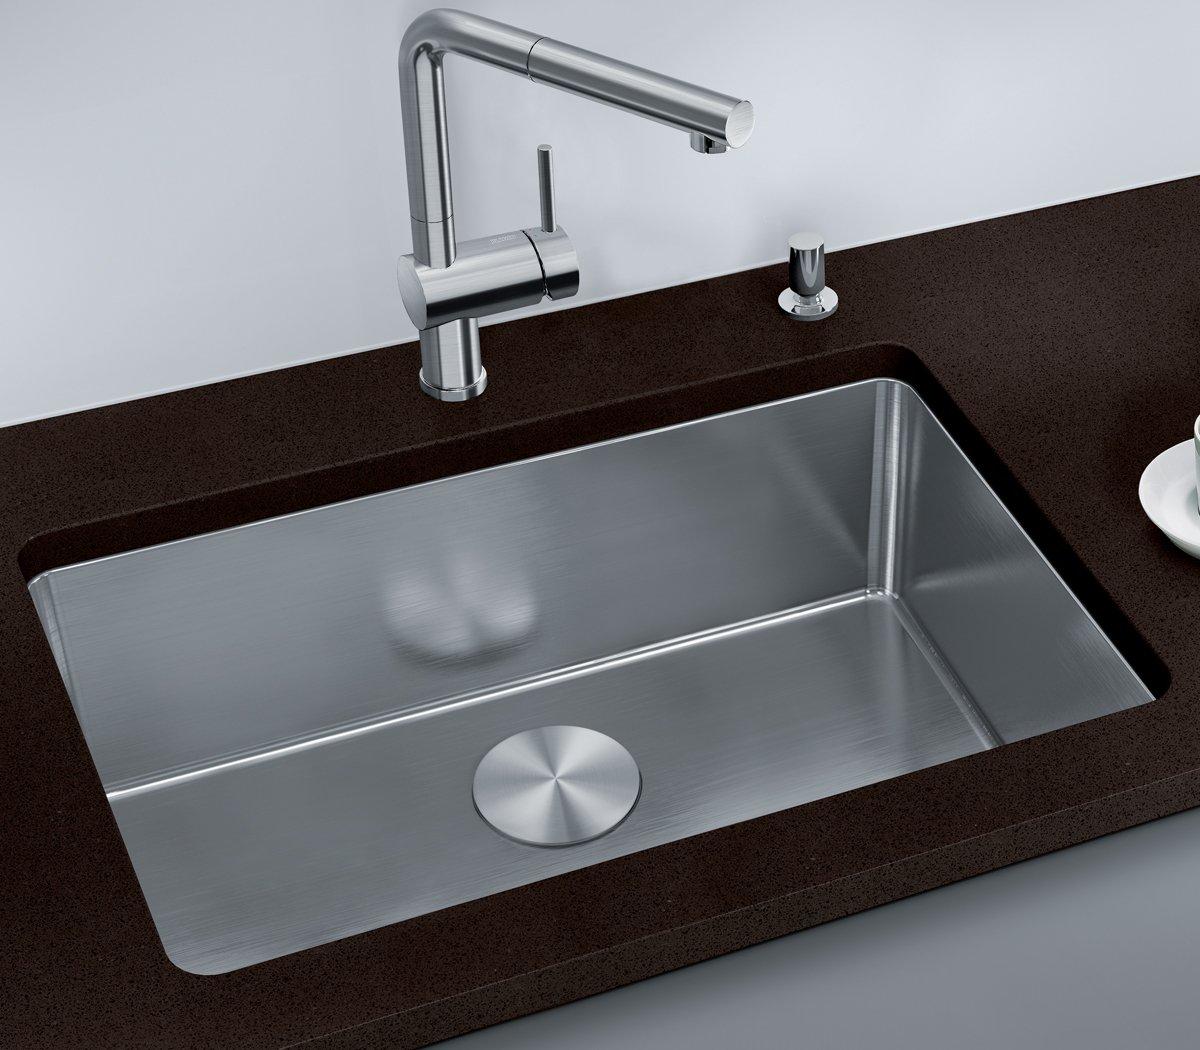 Merveilleux Blanco ANDANO700UK5 Undermount Sink. Undermount